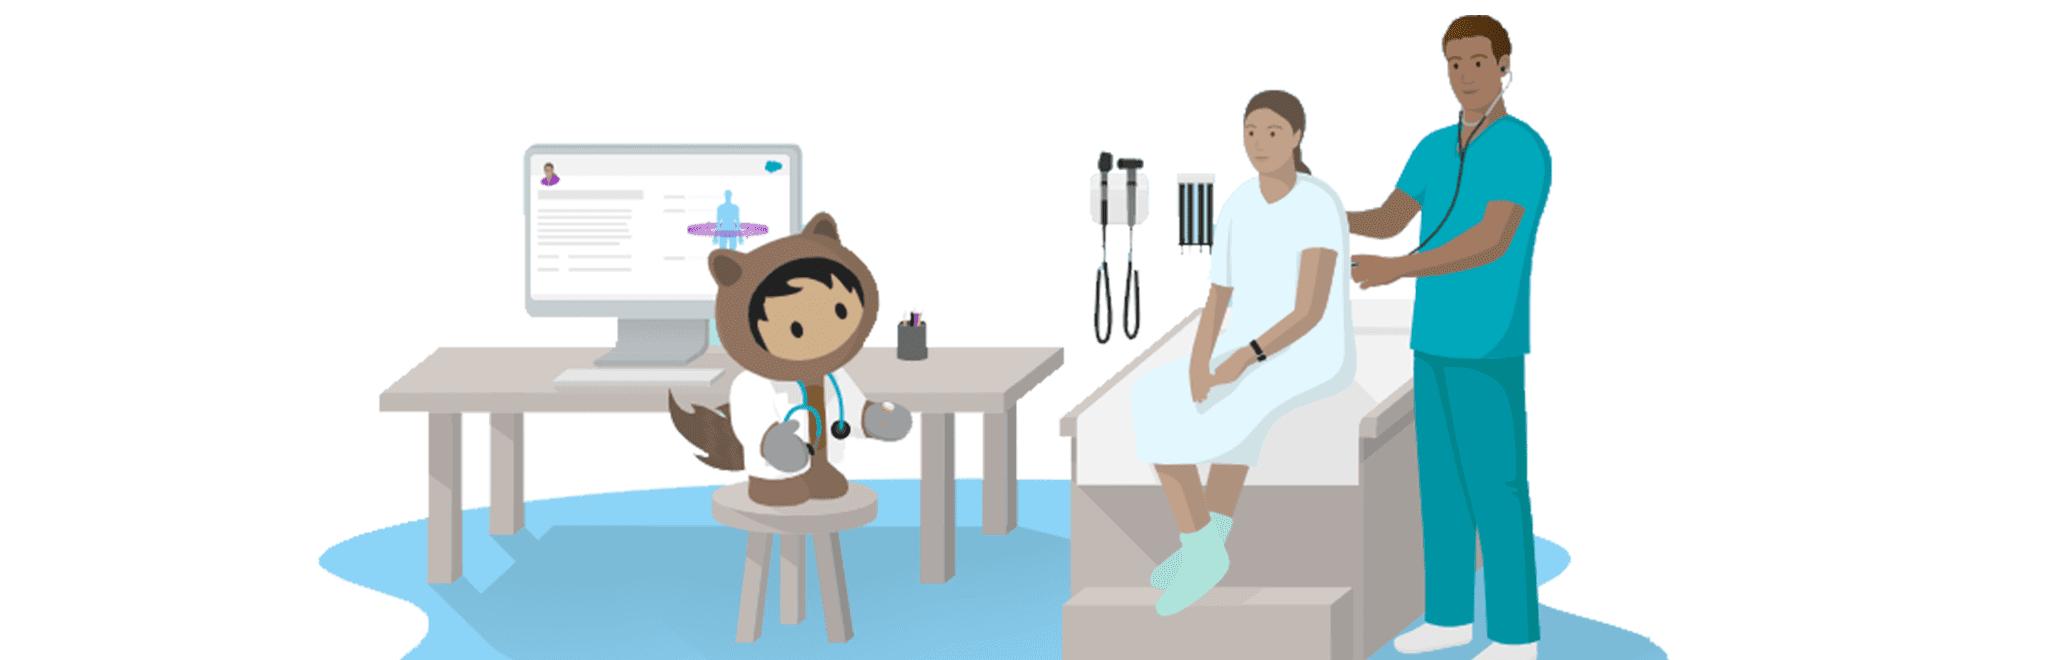 Salesforce healthcare